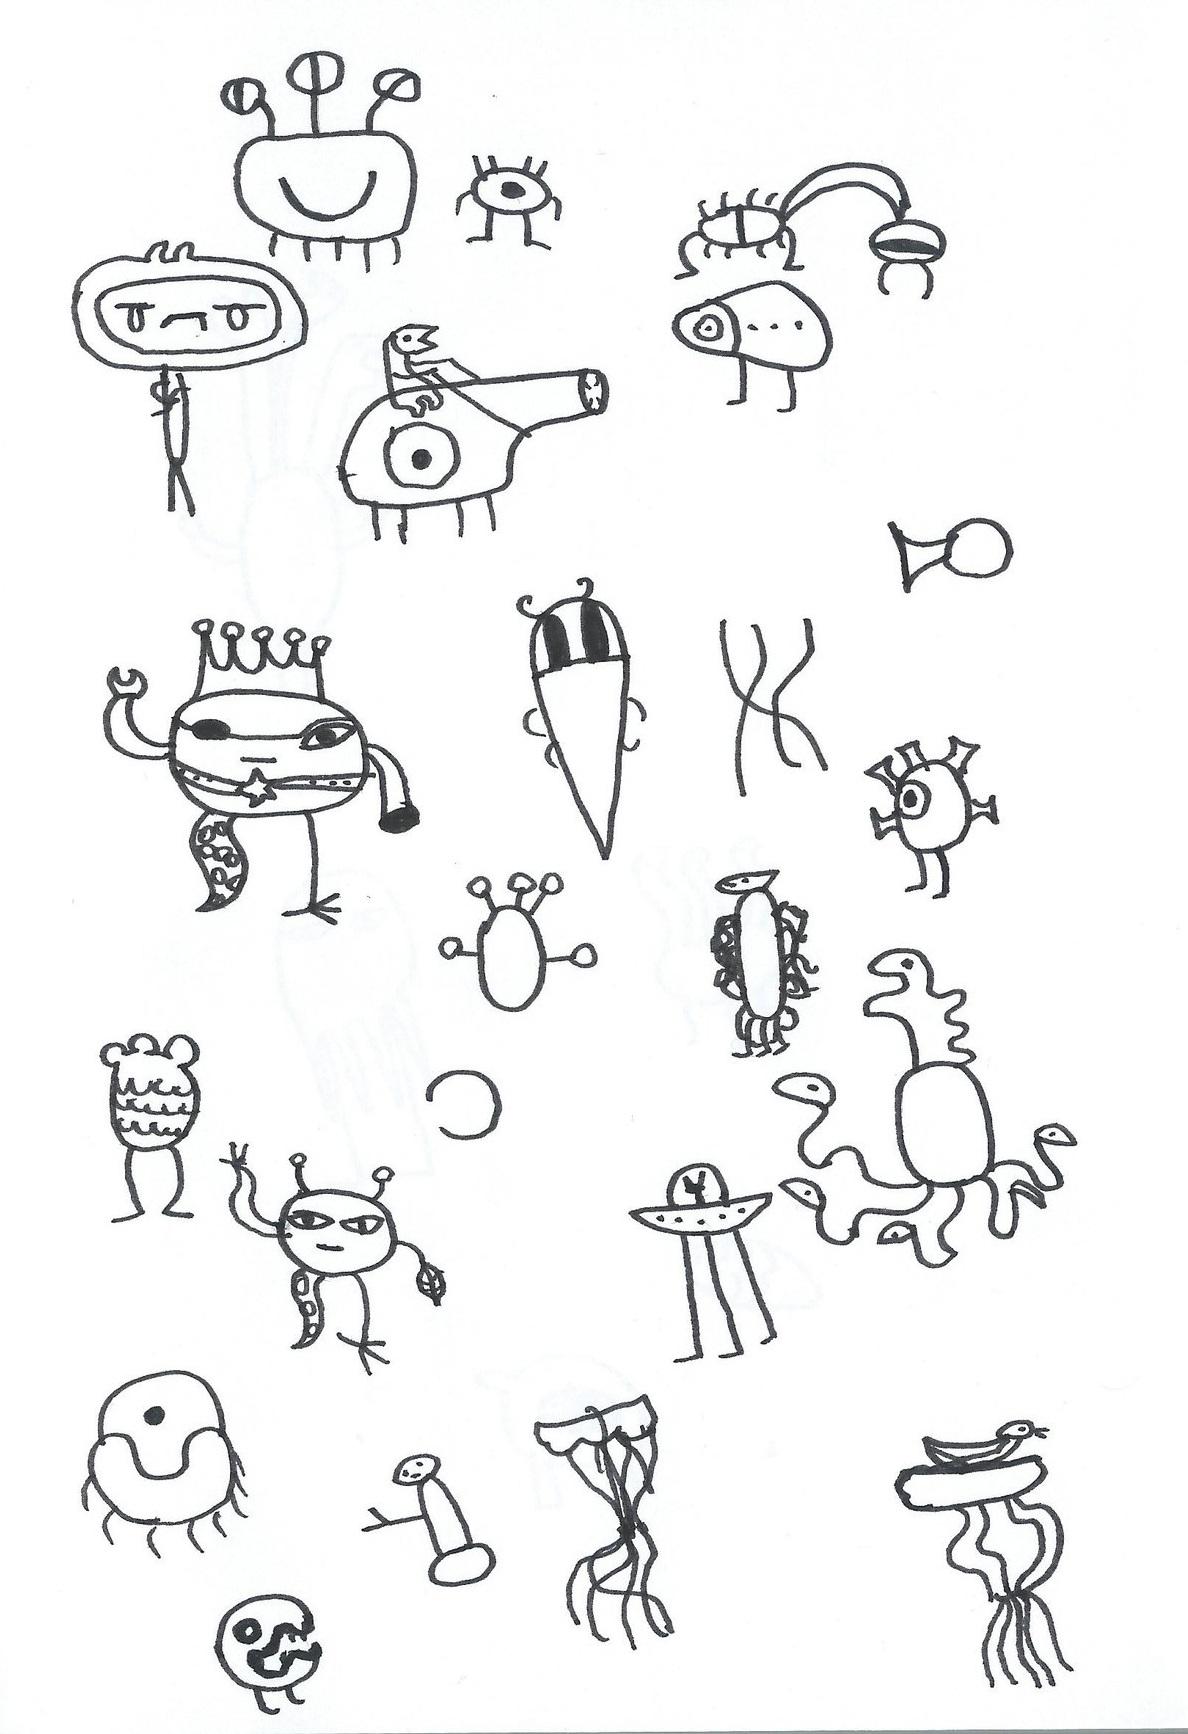 Various-character-design.JPG